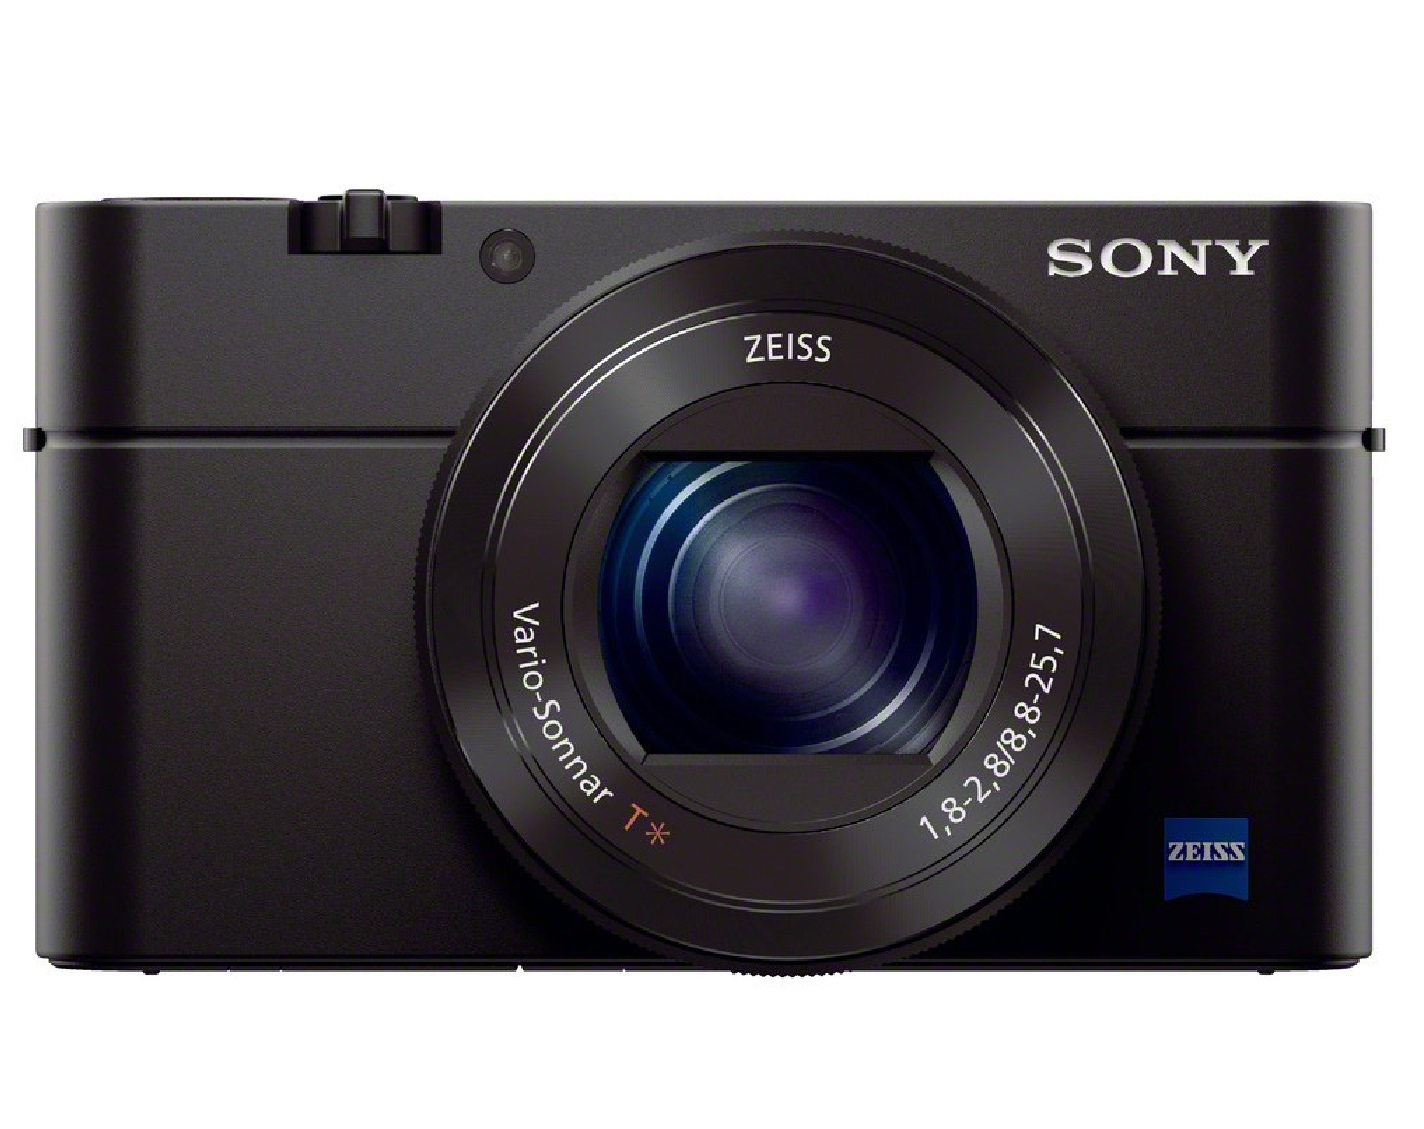 Sony compactcamera